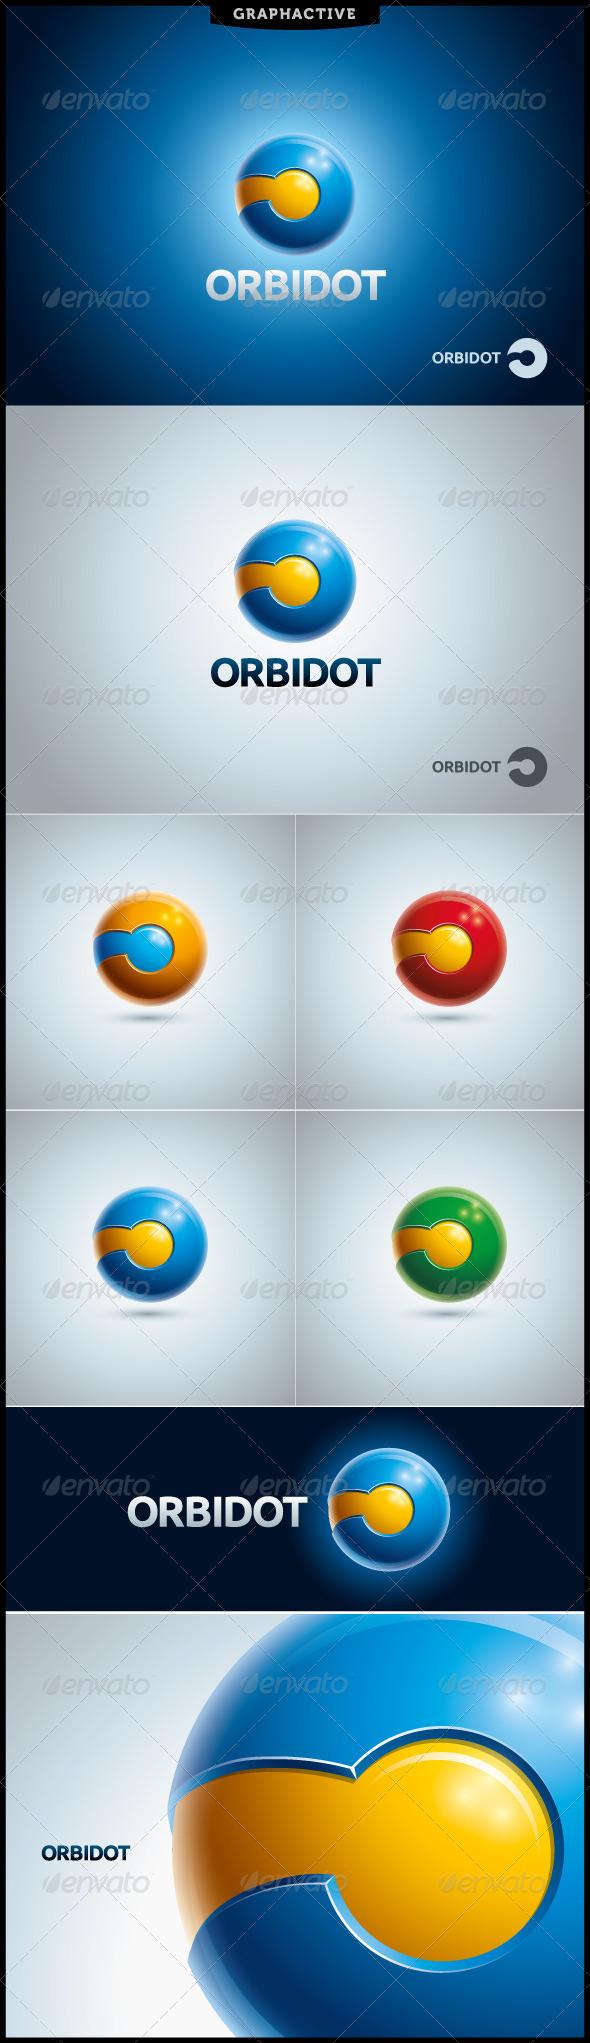 GraphicRiver Orbidot Globe Logo Template 4300216